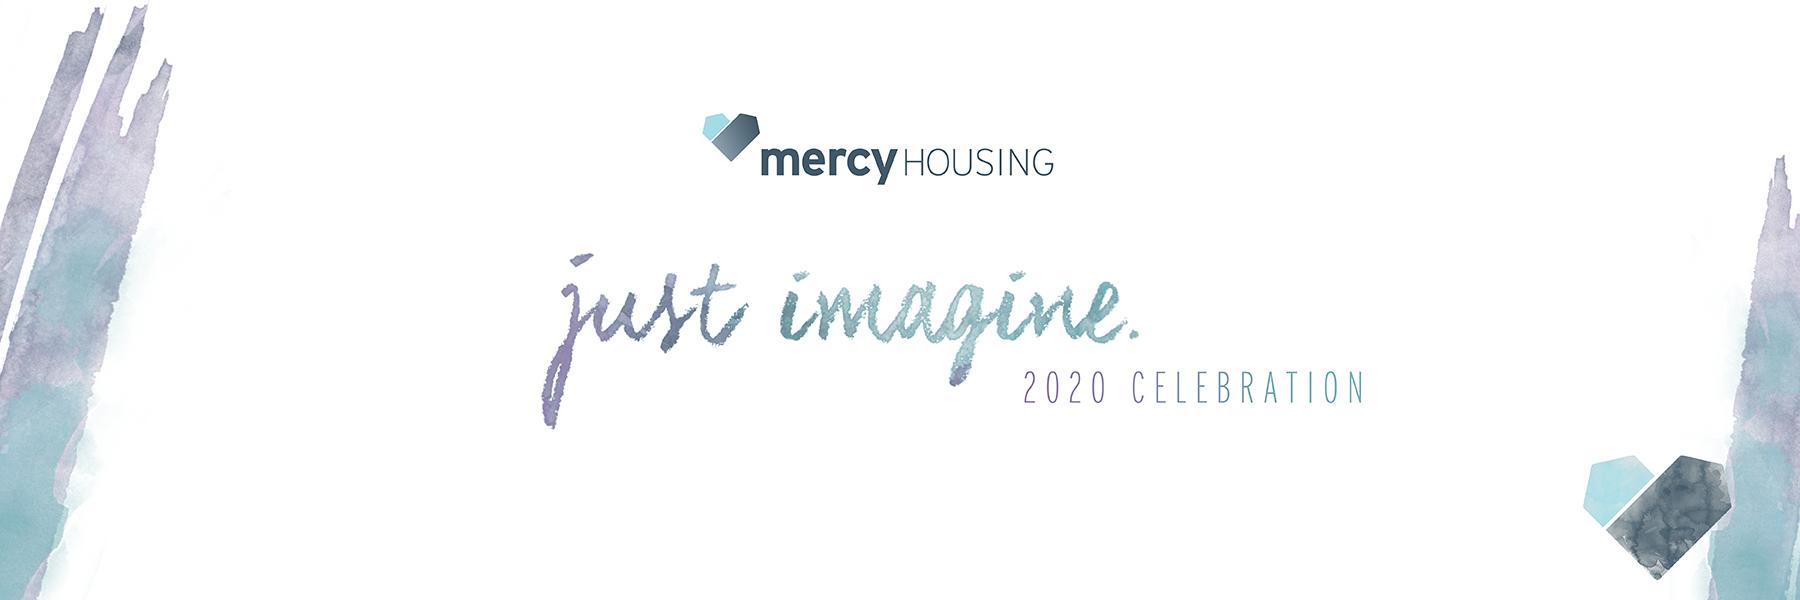 Just Imagine 2020 Celebration